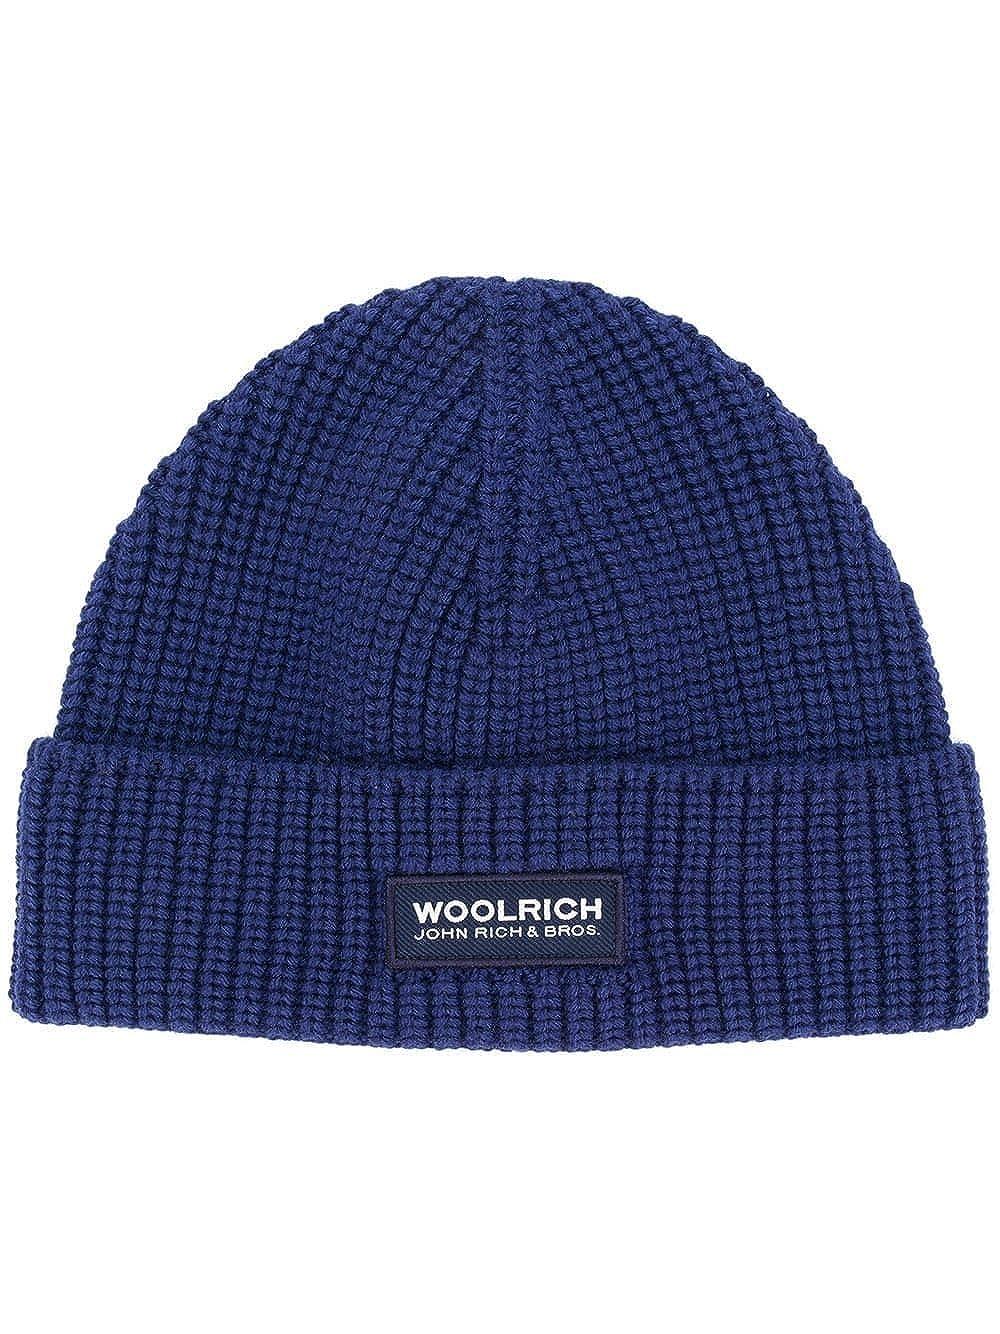 Woolrich Cappello Uomo WOACC1532AC223667 Lana Blu